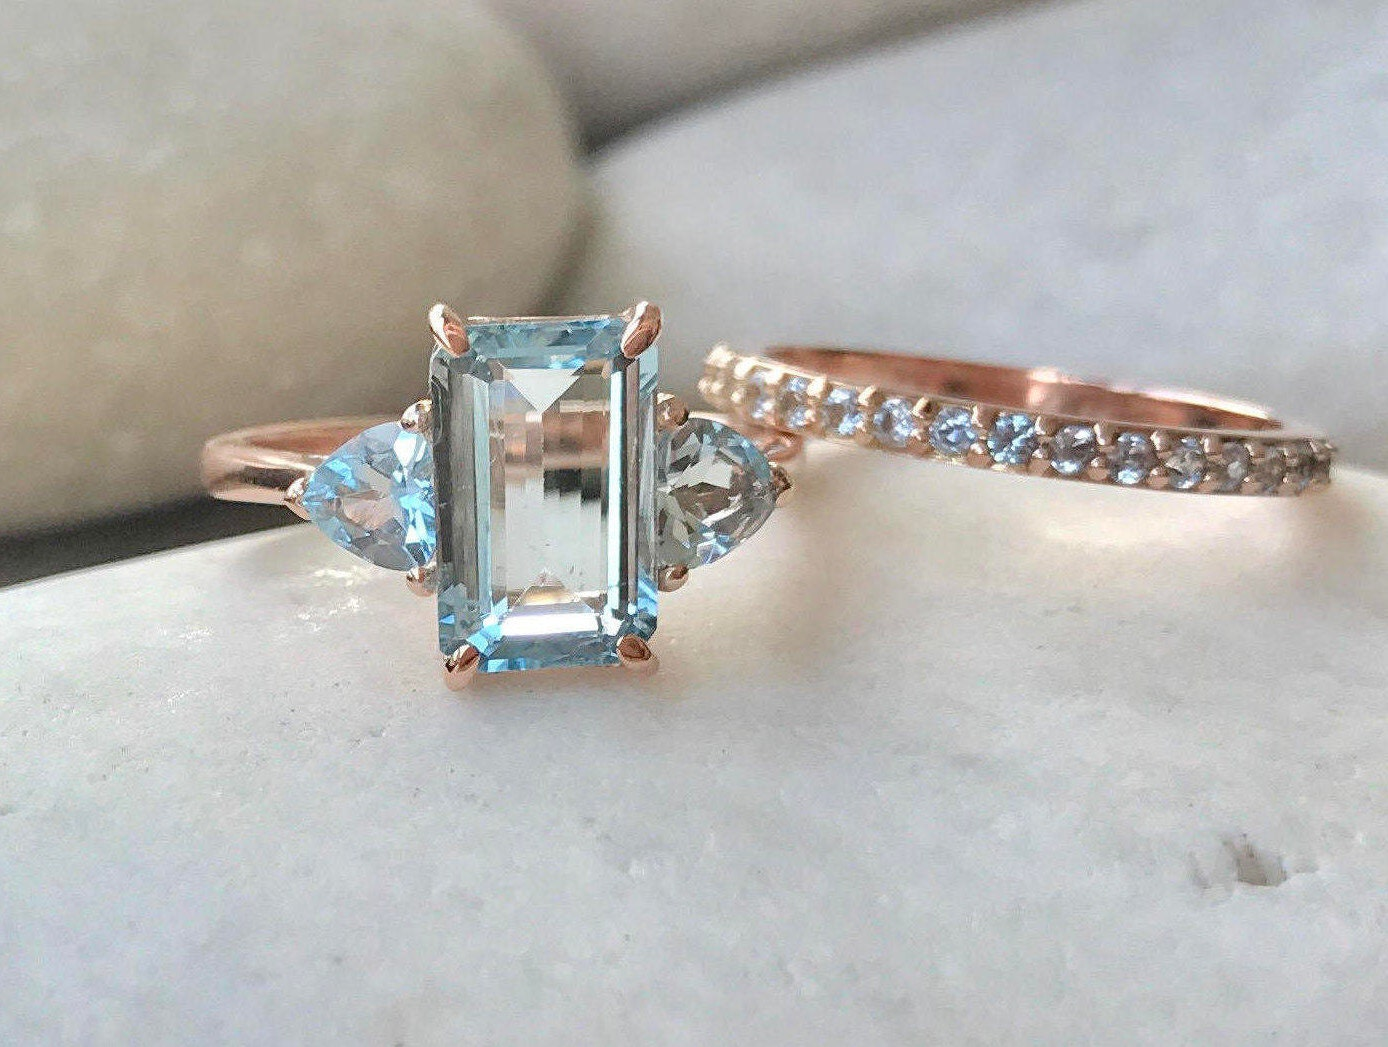 Rose Gold Aquamarine Ring  Aquamarine Engagement Ring Set  Emerald Cut Bridal  Set  Unique Aquamarine Wedding Ring  Rectangle Ring Set